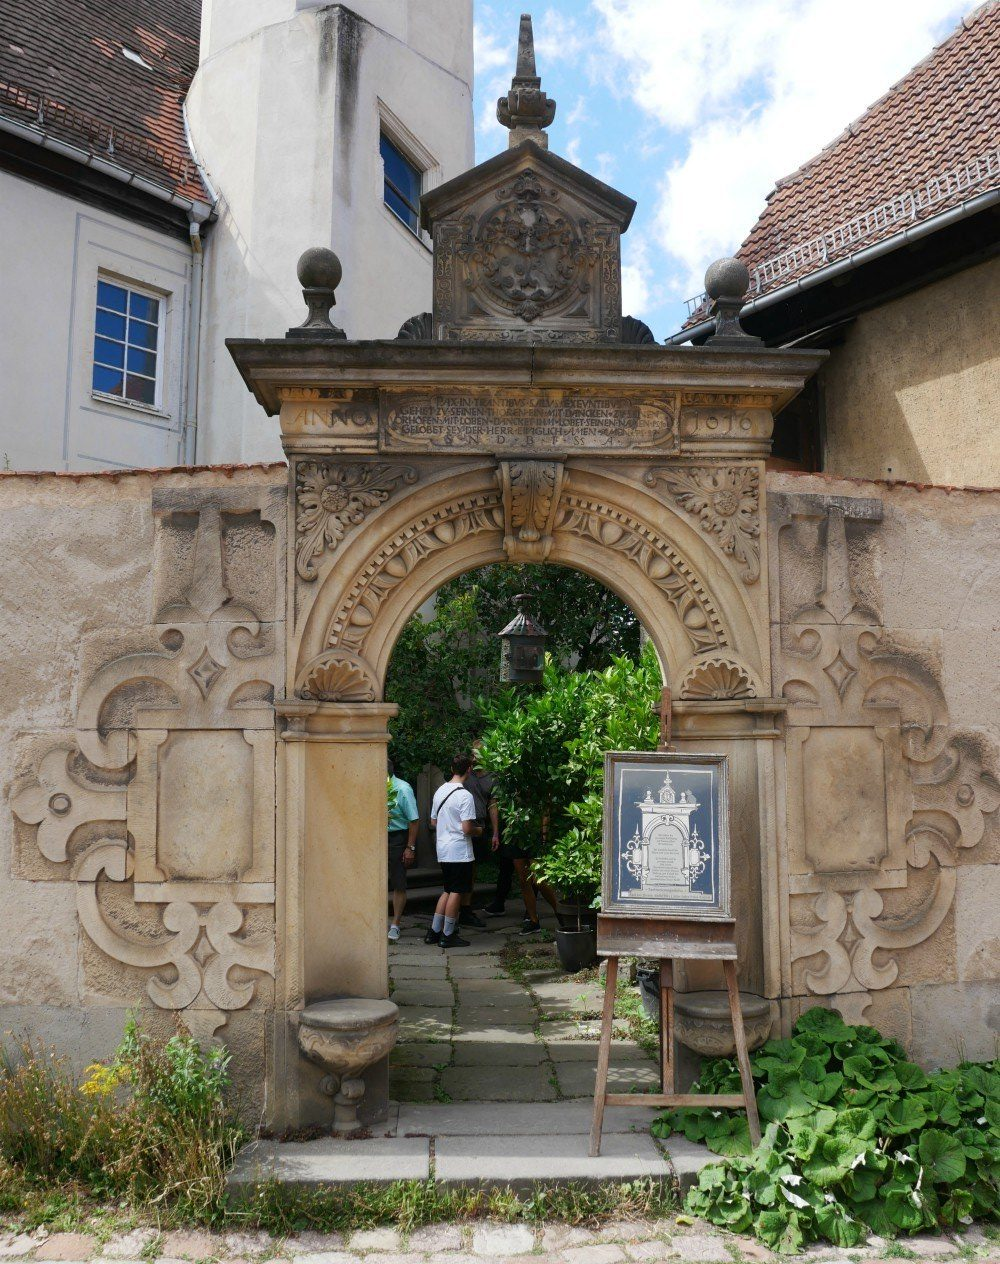 Old gateway in Meissen in Saxony, Germany Photo Heatheronhertravels.com